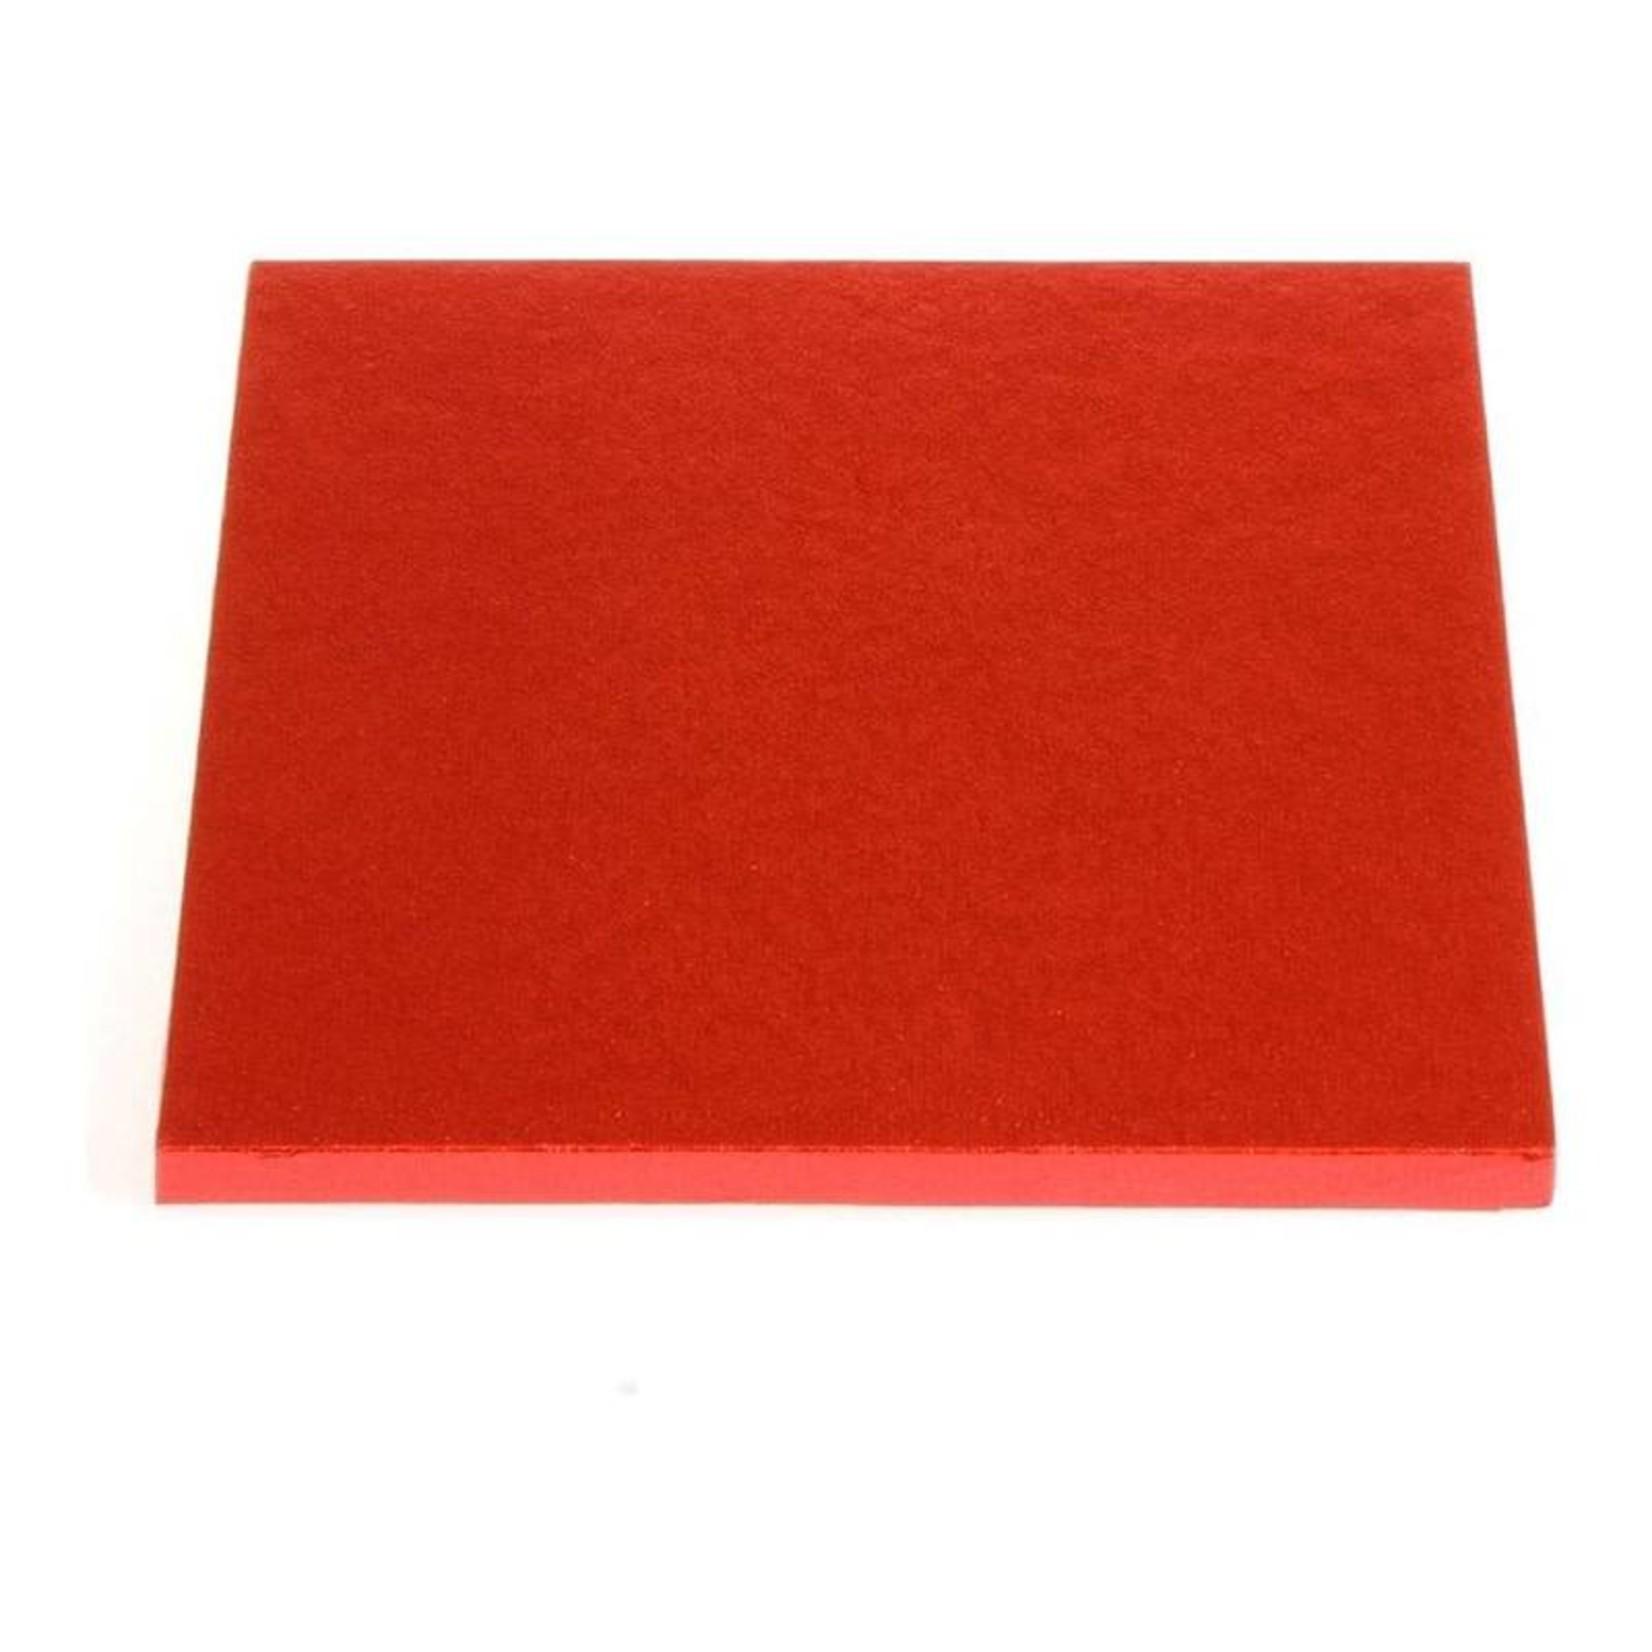 "Enjay Enjay - Cake drum - 1/2"" square, Red -"